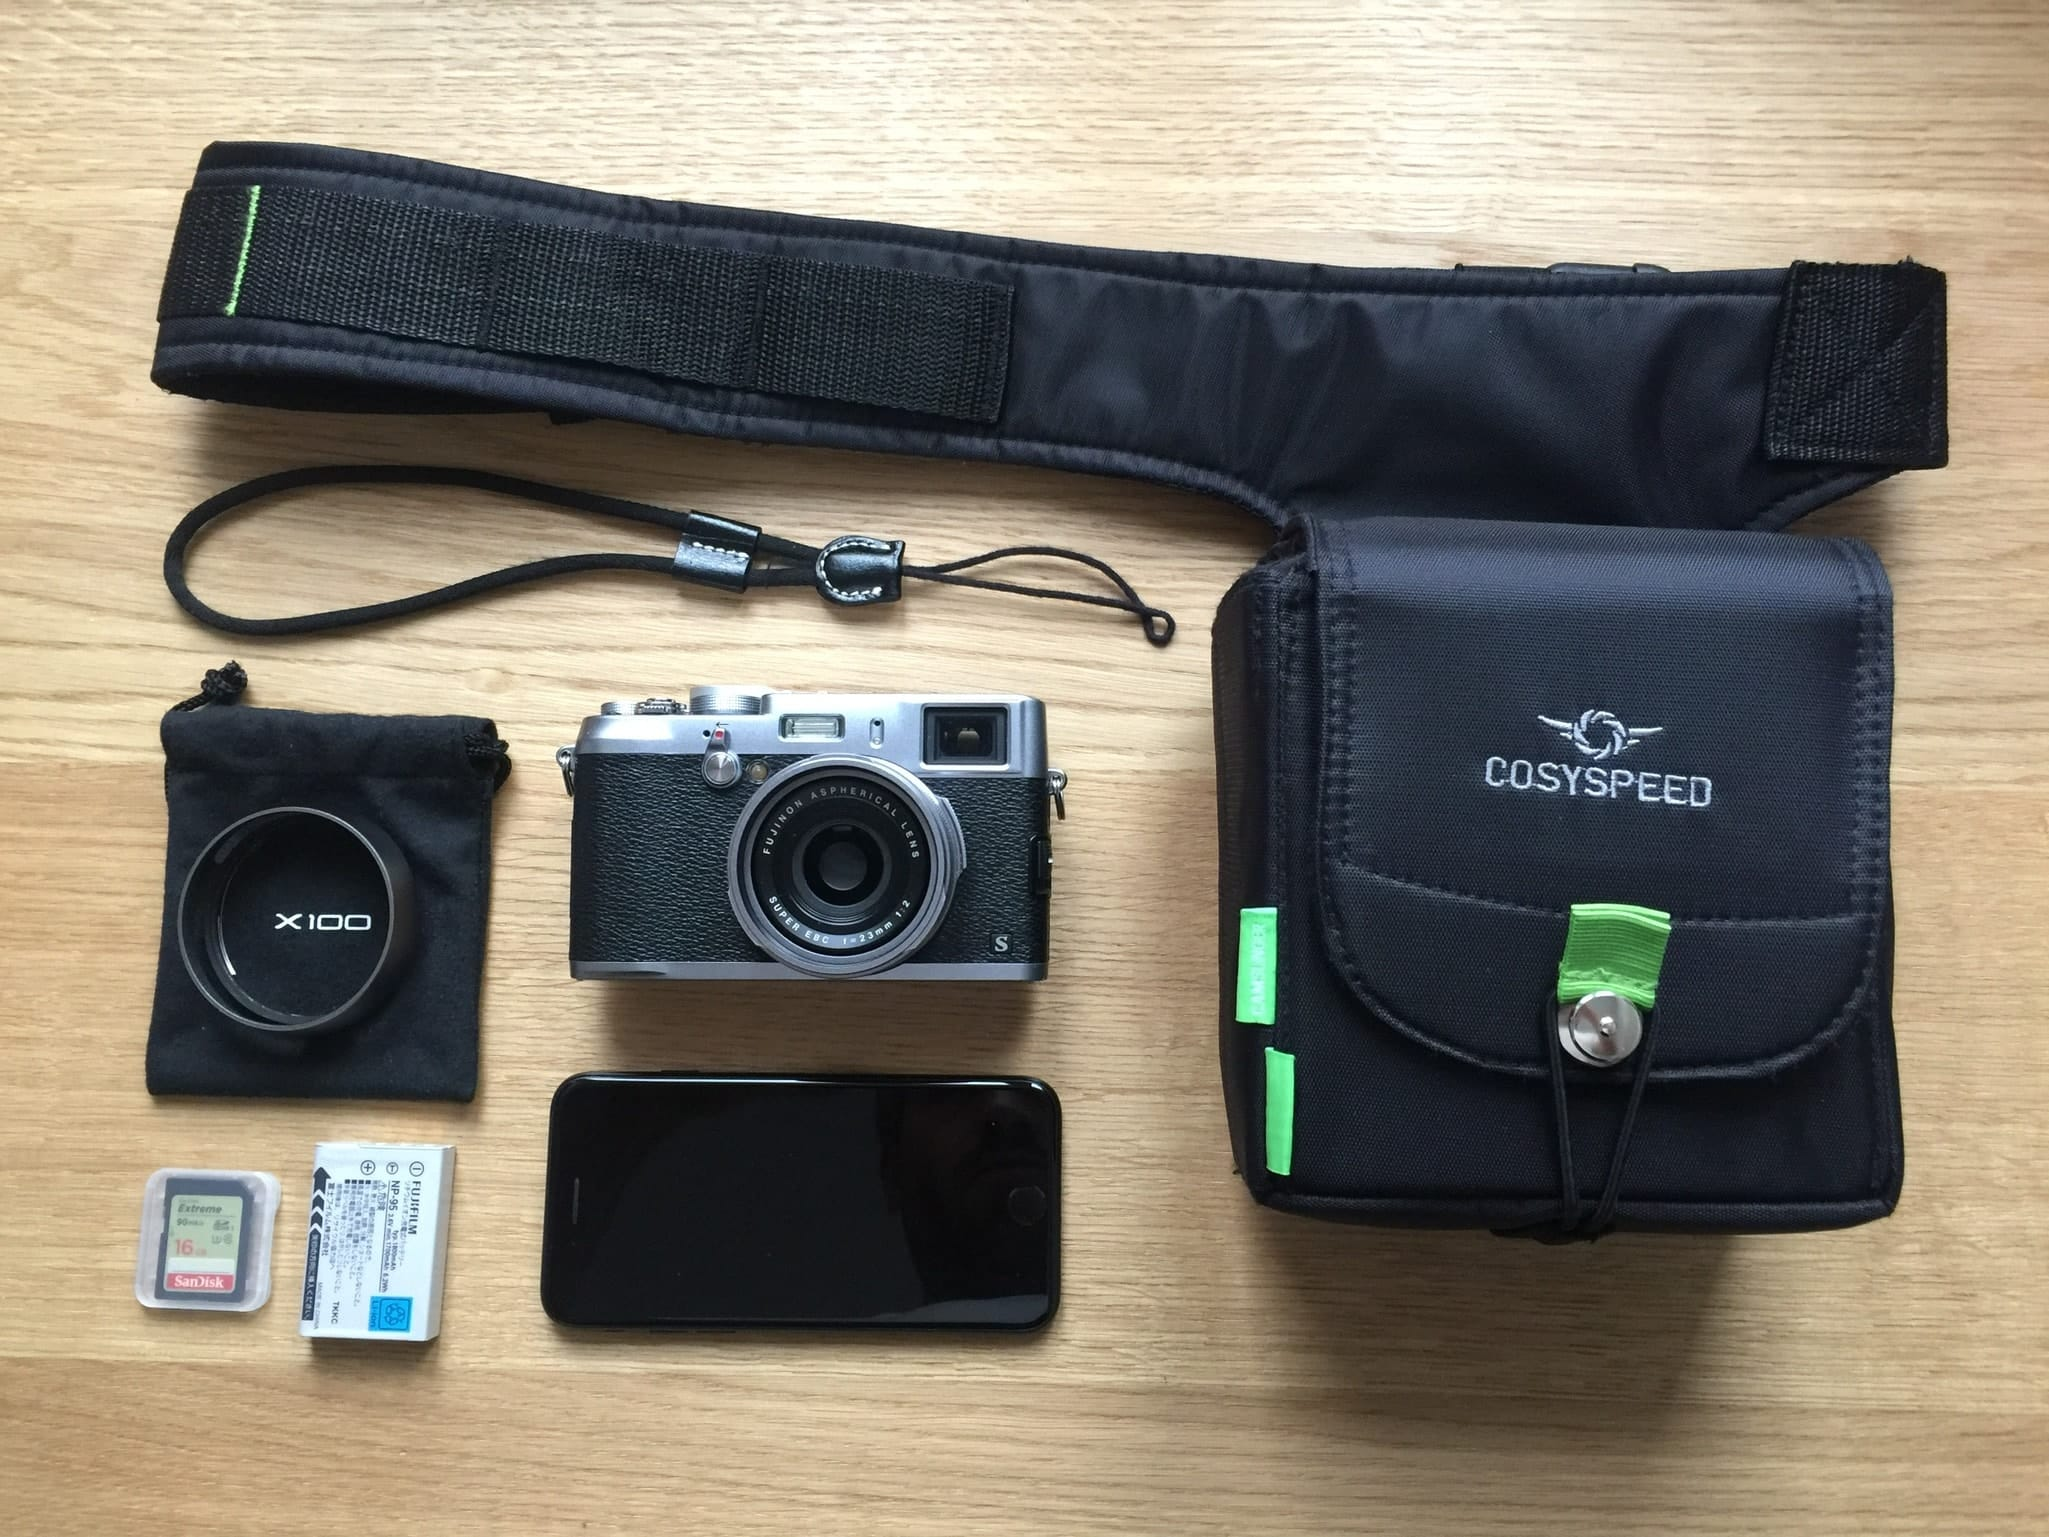 Inside Jacint Juhasz's camera bag